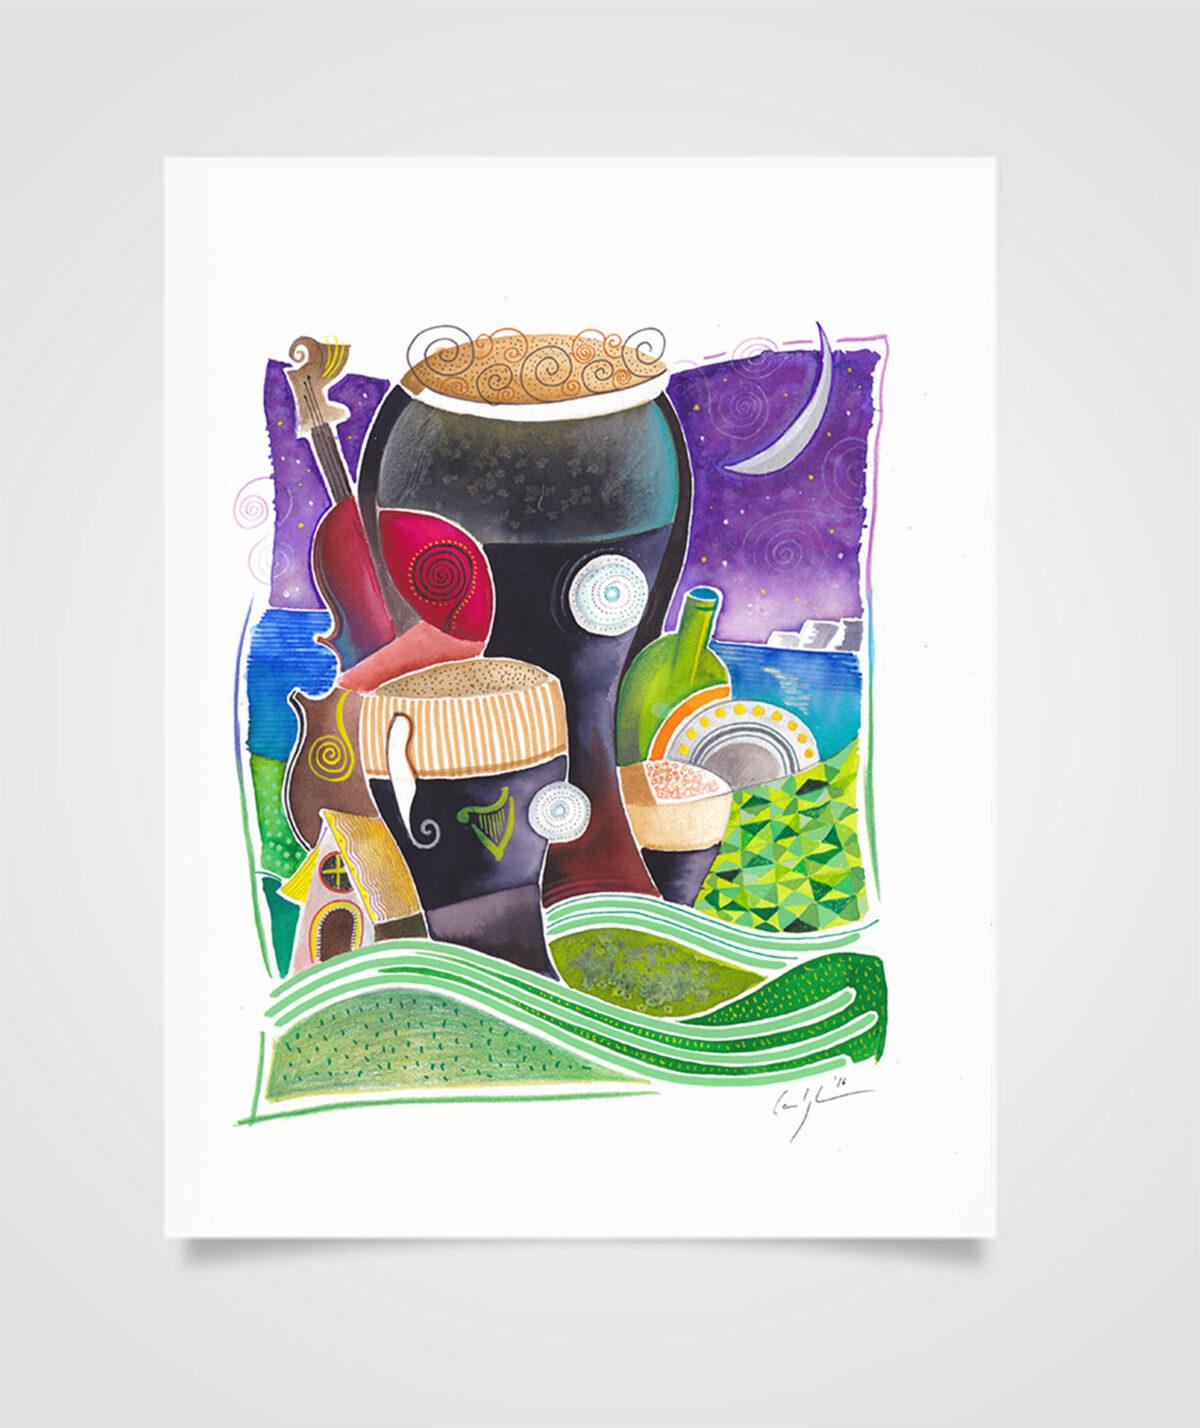 """Eire - About the Cliffs"" Tecniche miste su carta, 21 x 29,7 cm (2016)"